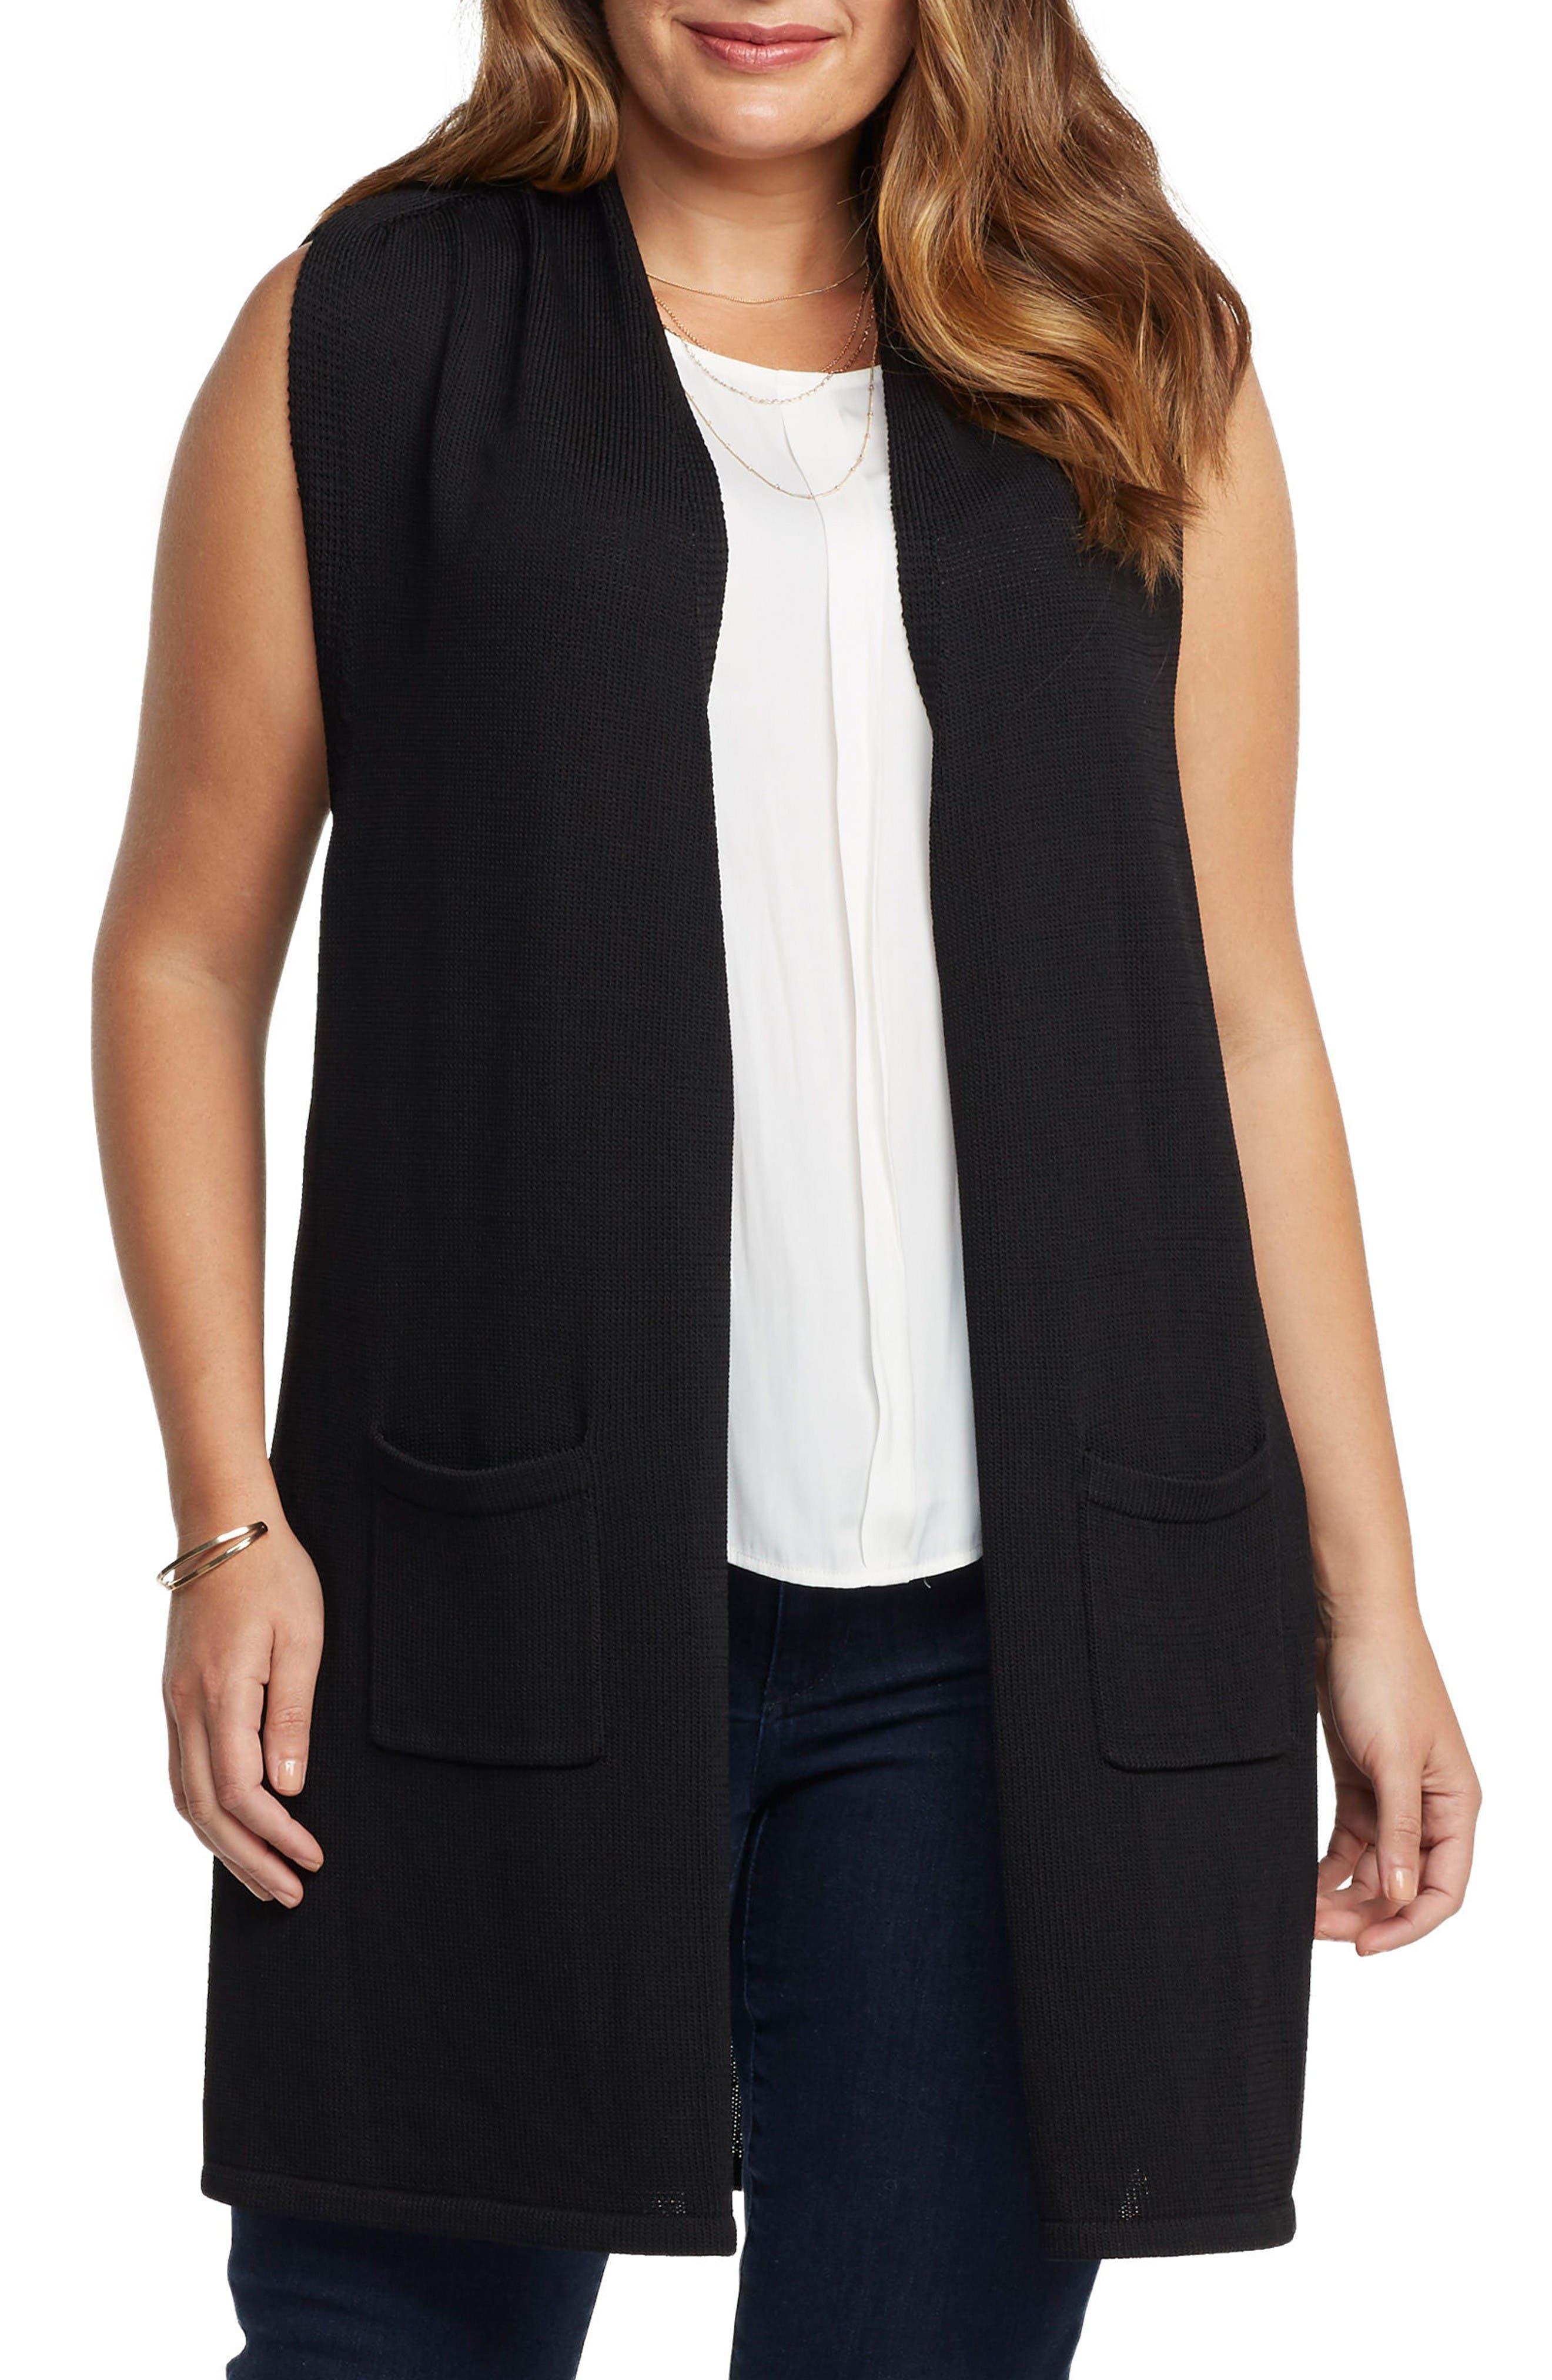 Main Image - Tart Holly Knit Open Front Vest (Plus Size)